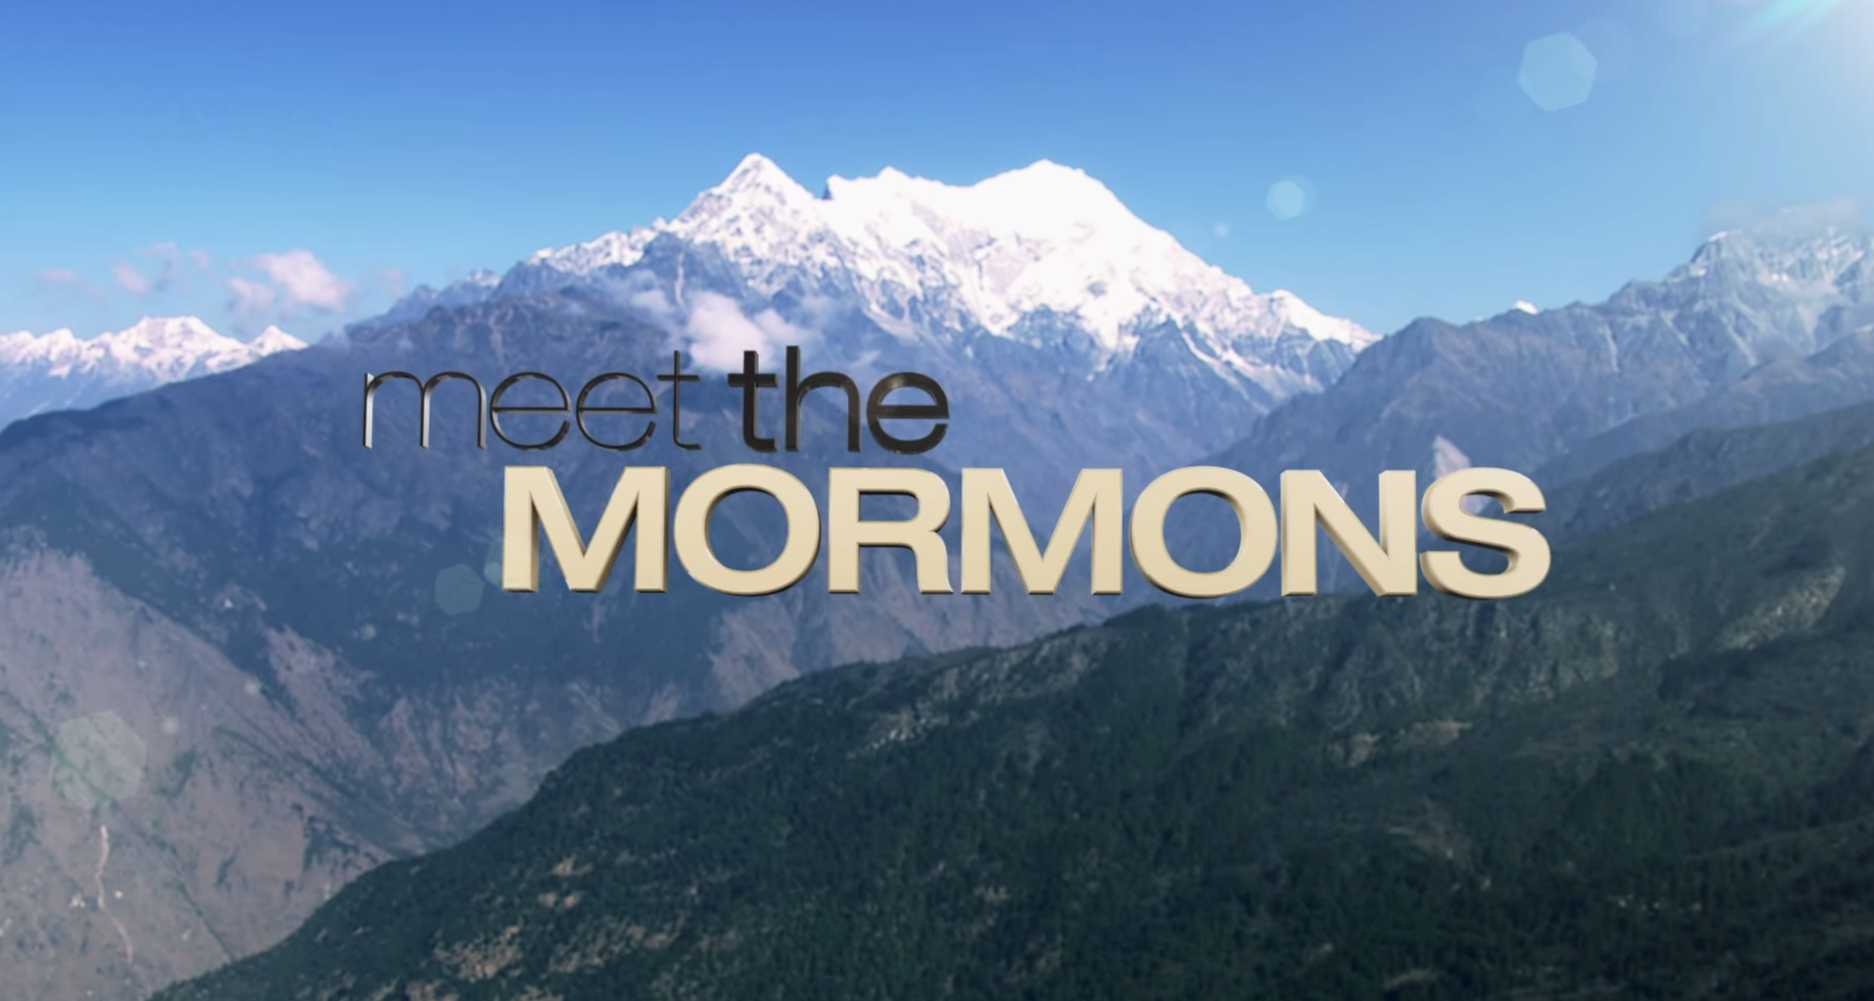 meet-the-mormons